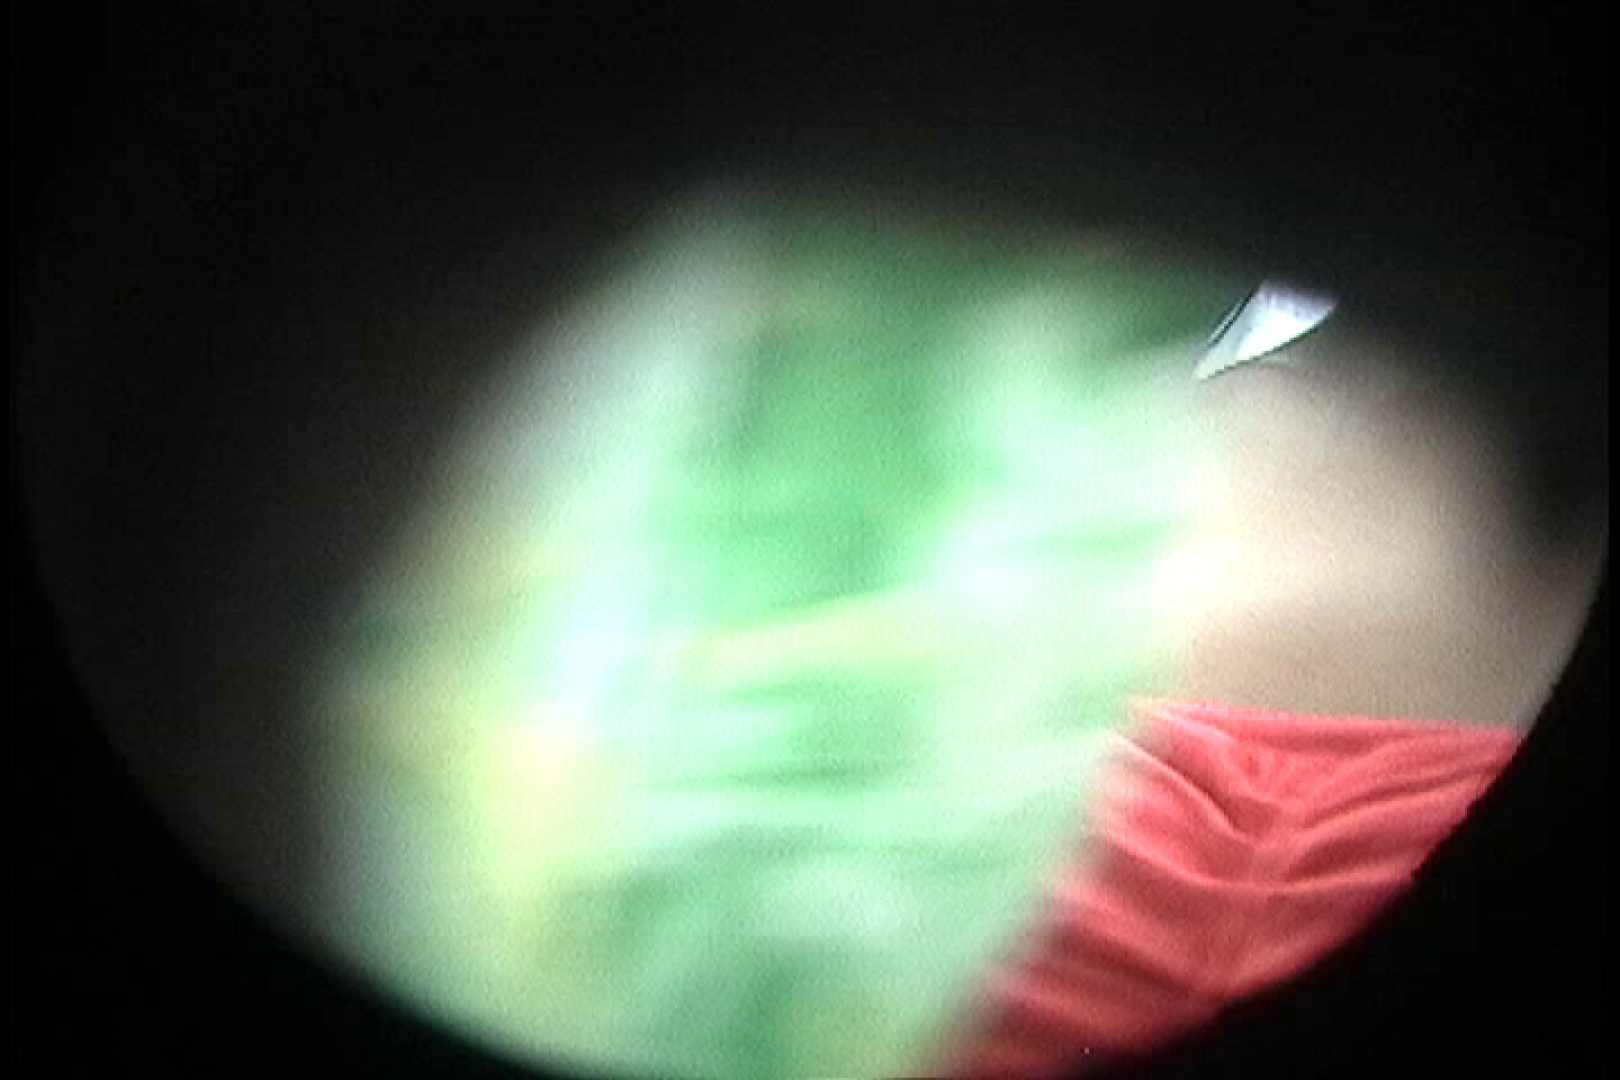 No.22 日焼け跡とオッパイの関係がおかしな貧乳ギャル 貧乳 エロ無料画像 13pic 3